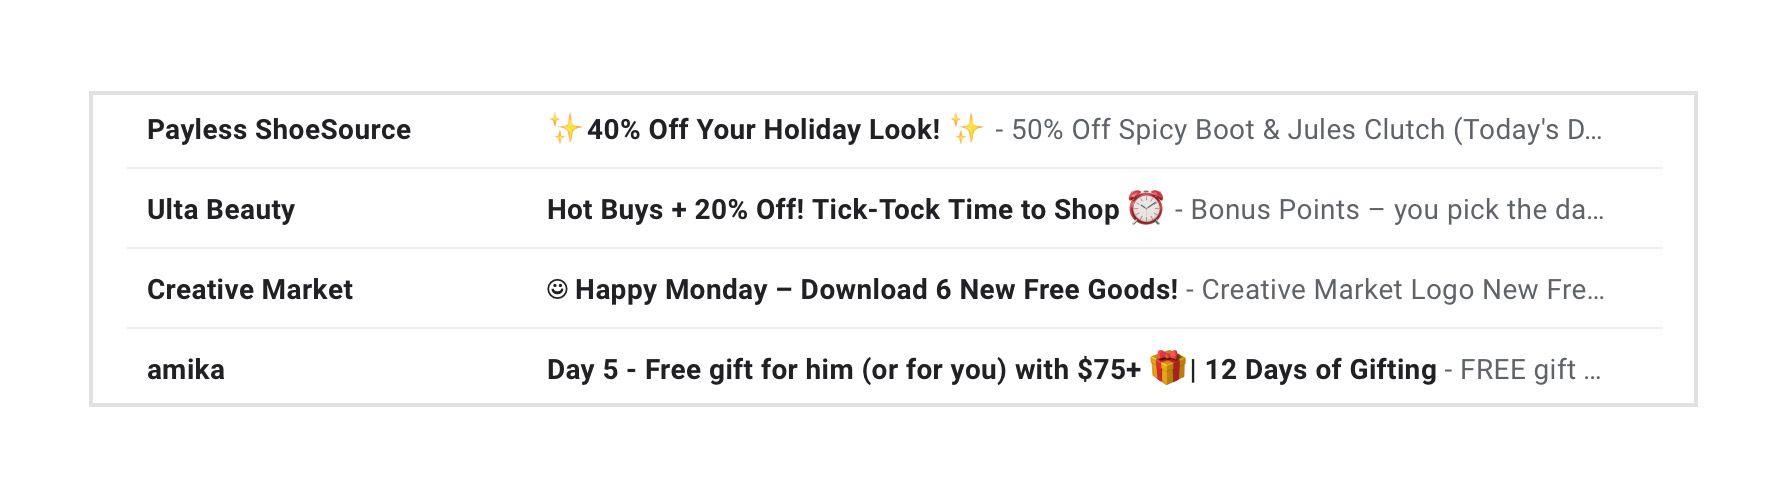 Alexa read me my newest email  | Marketing Stuff | Alexa